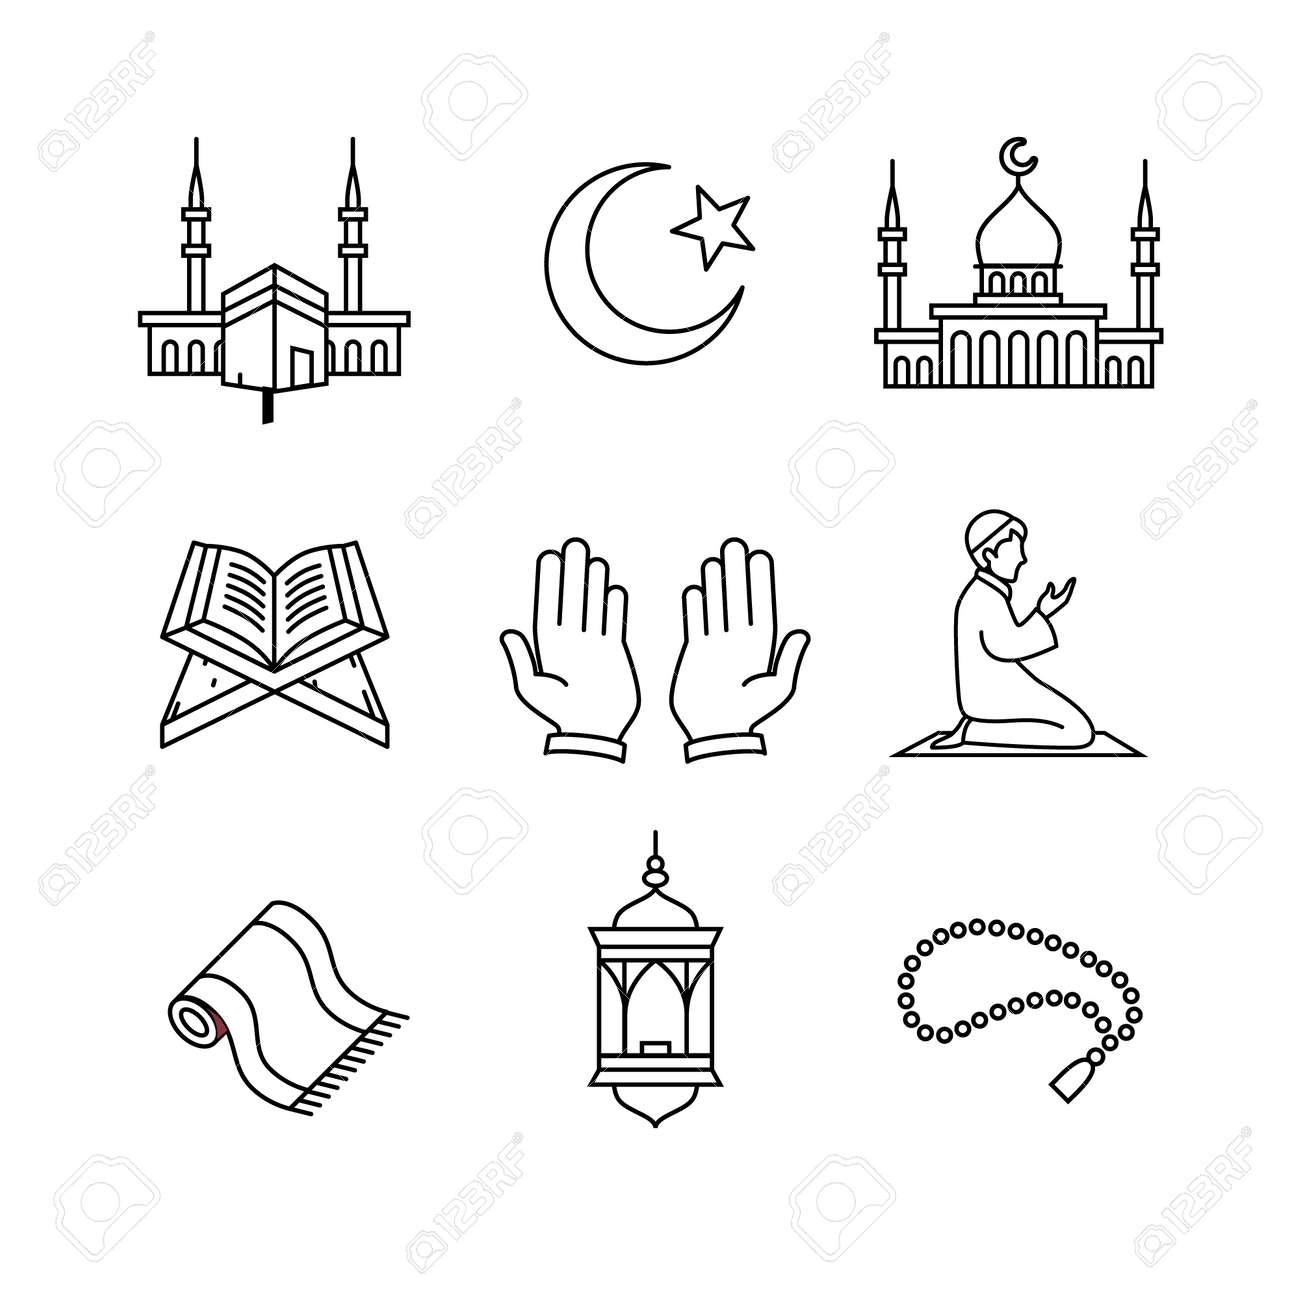 Muslim islam prayer and ramadan kareem thin line art icons set. Modern black symbols isolated on white for infographics or web use. - 52937868